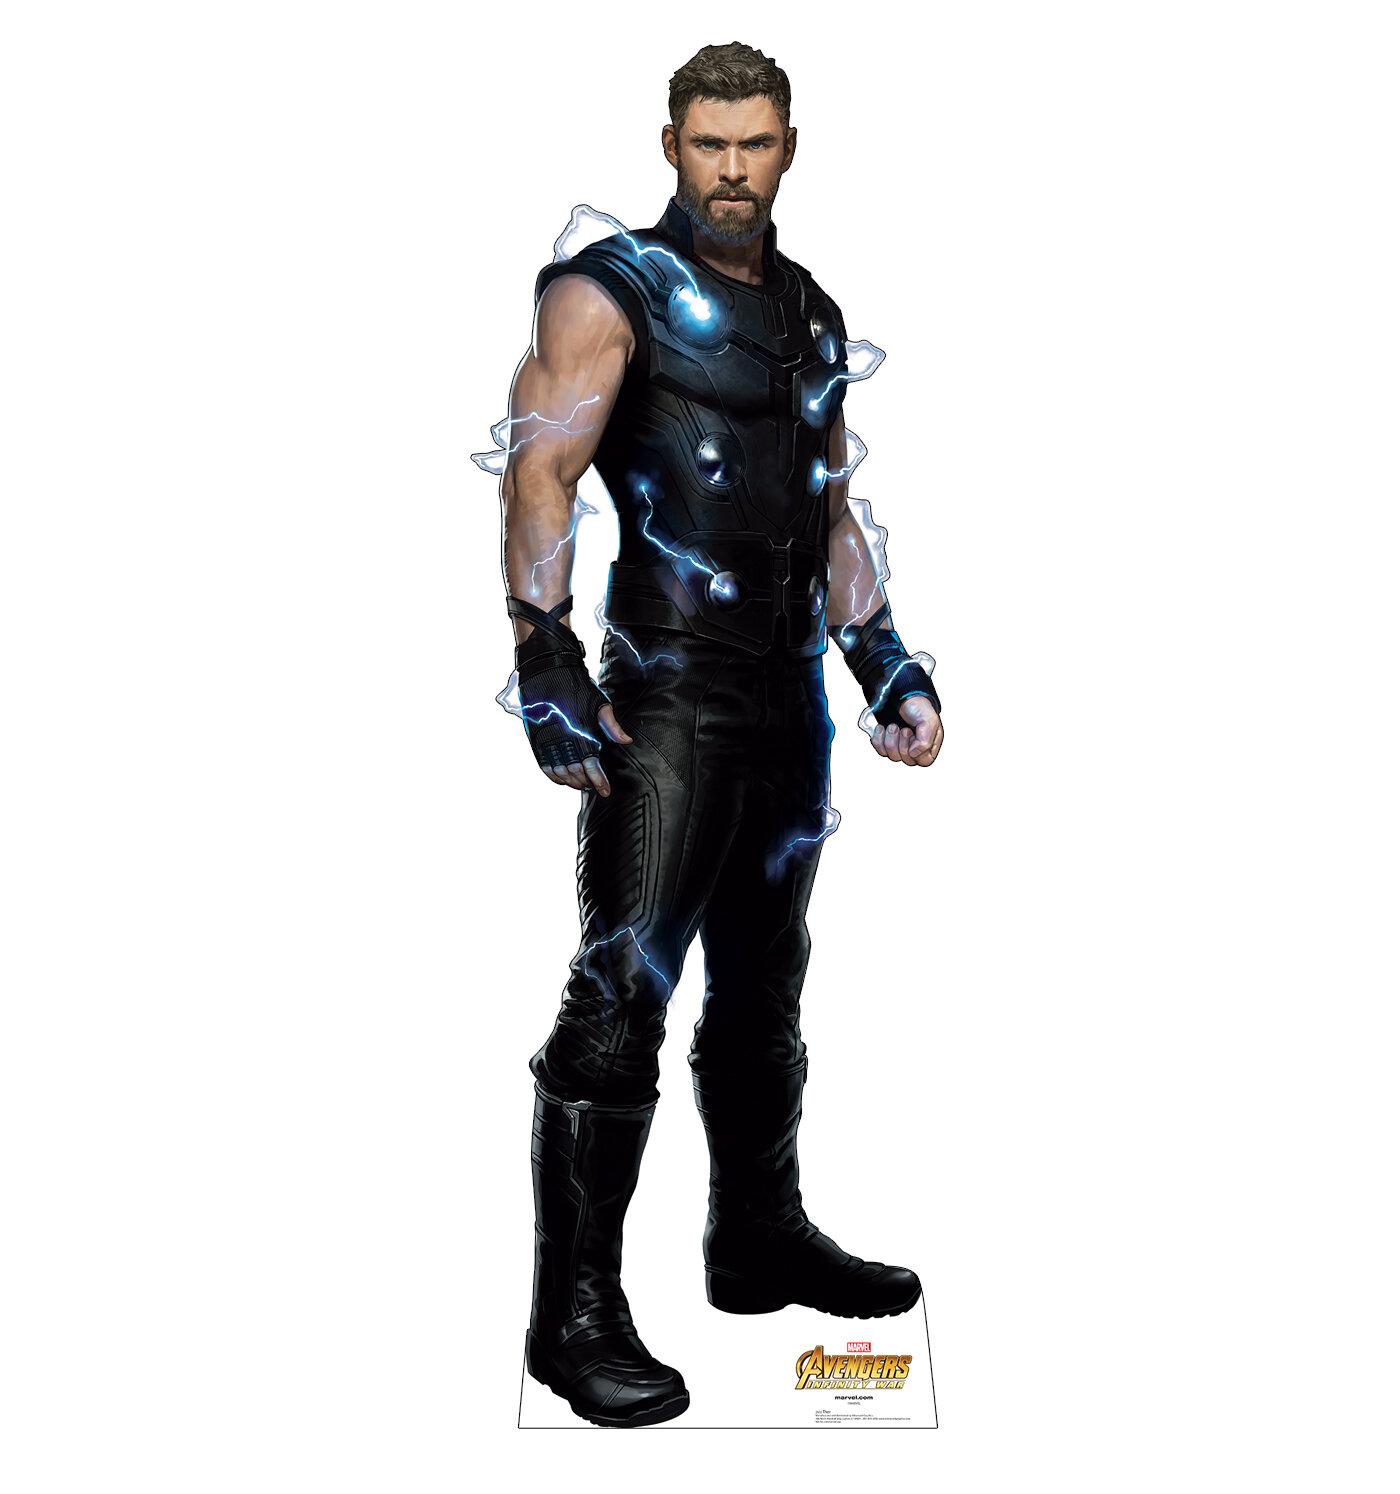 Advanced Graphics Avengers Infinity War Thor Standup Wayfair